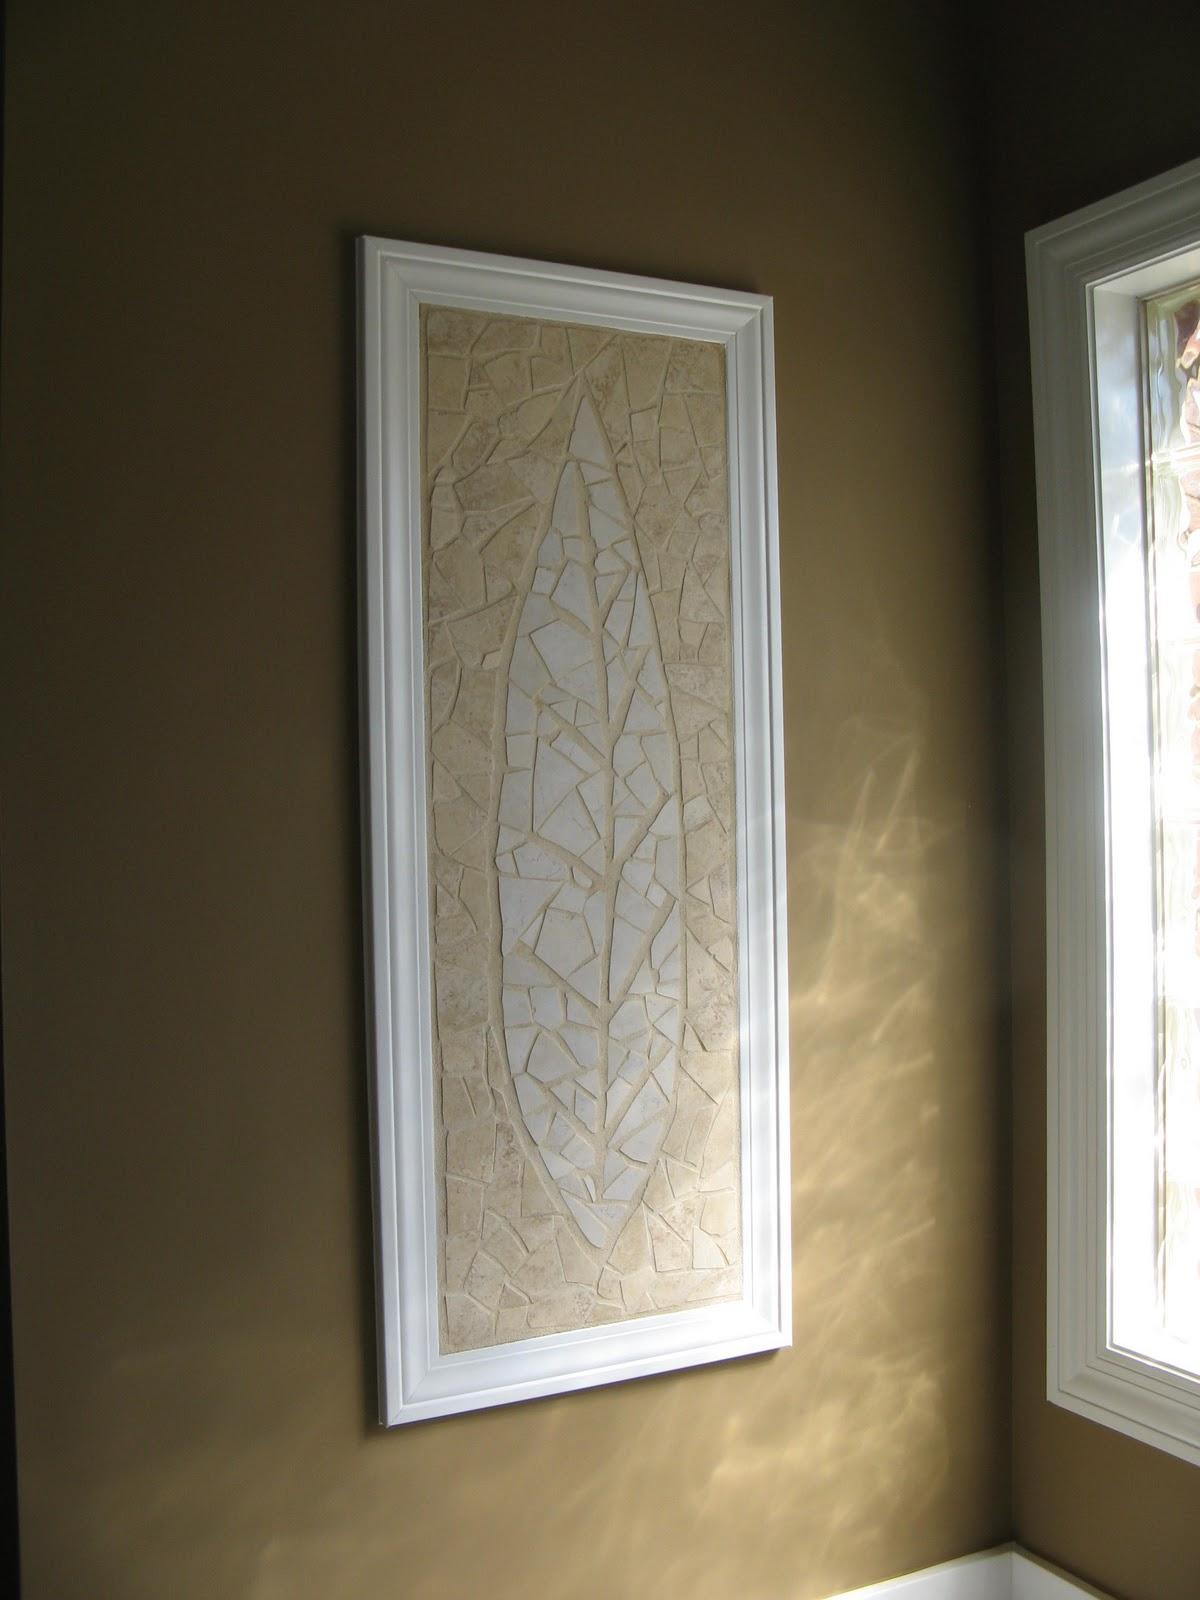 Susan snyder mosaic wall art ii broken ceramic tile mosaic wall art dailygadgetfo Gallery